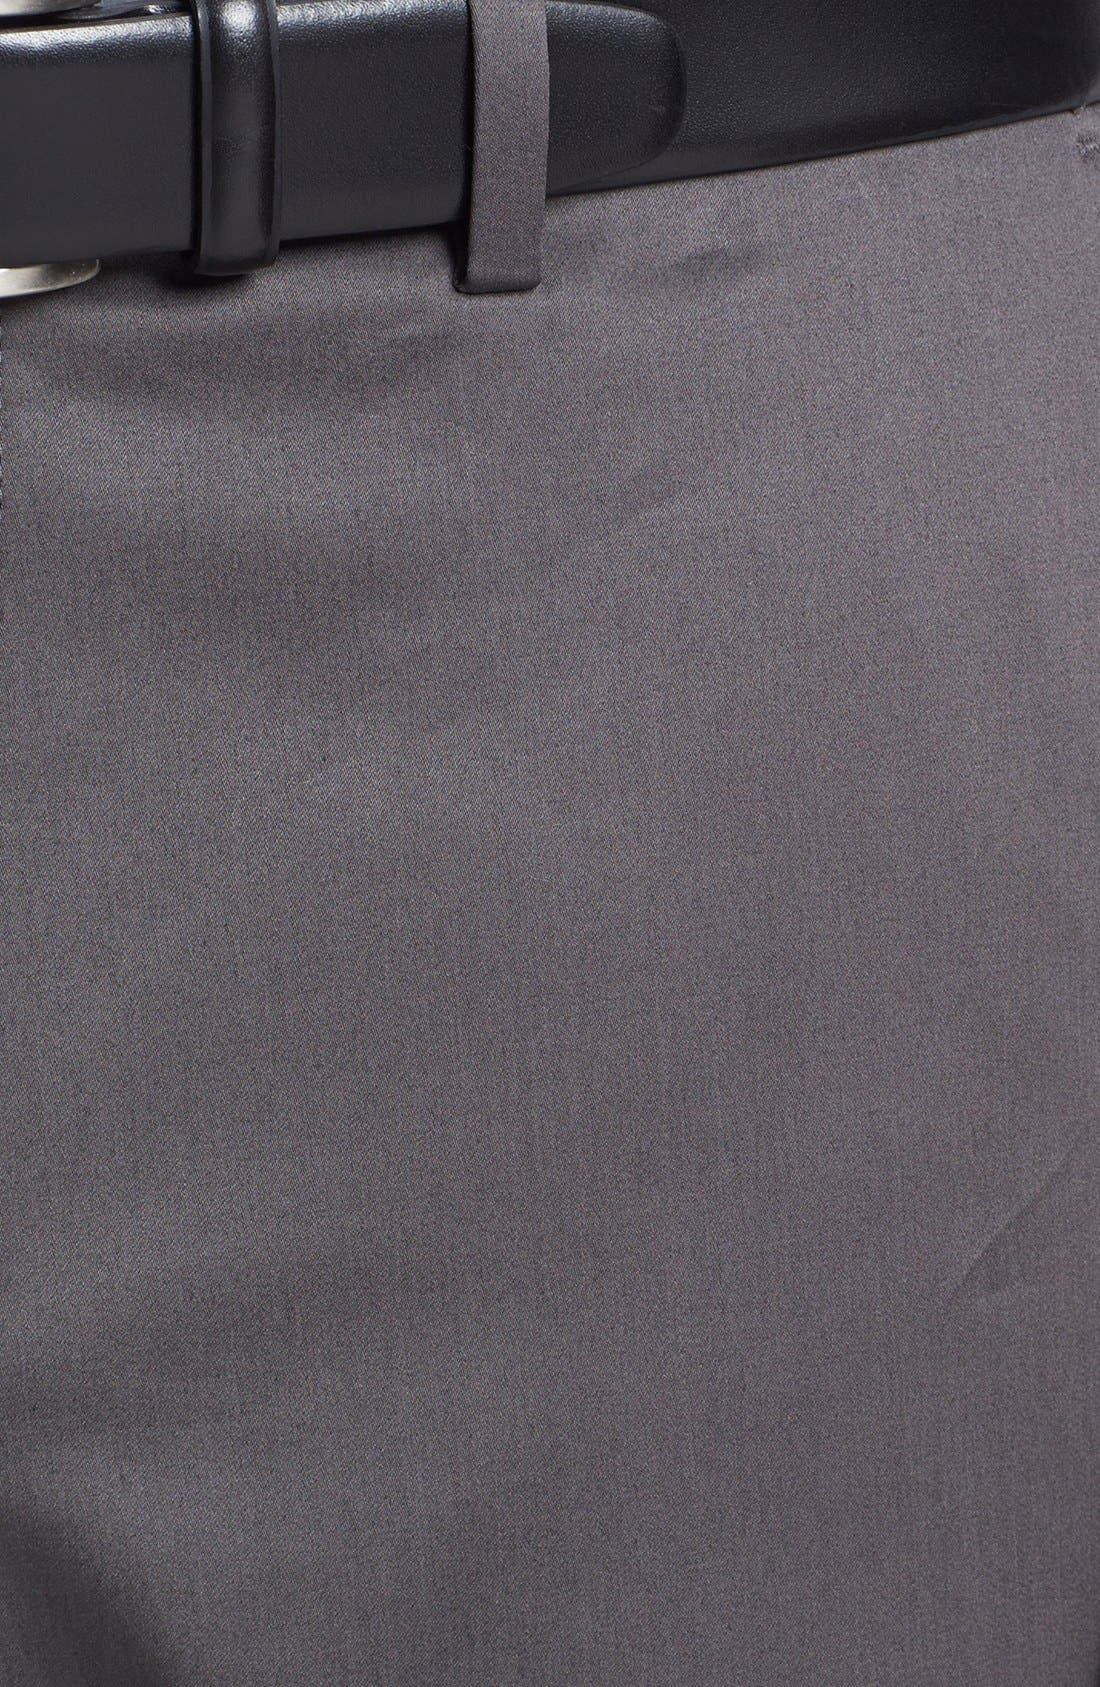 Alternate Image 3  - BOSS HUGO BOSS 'Sharp' Cotton Trousers